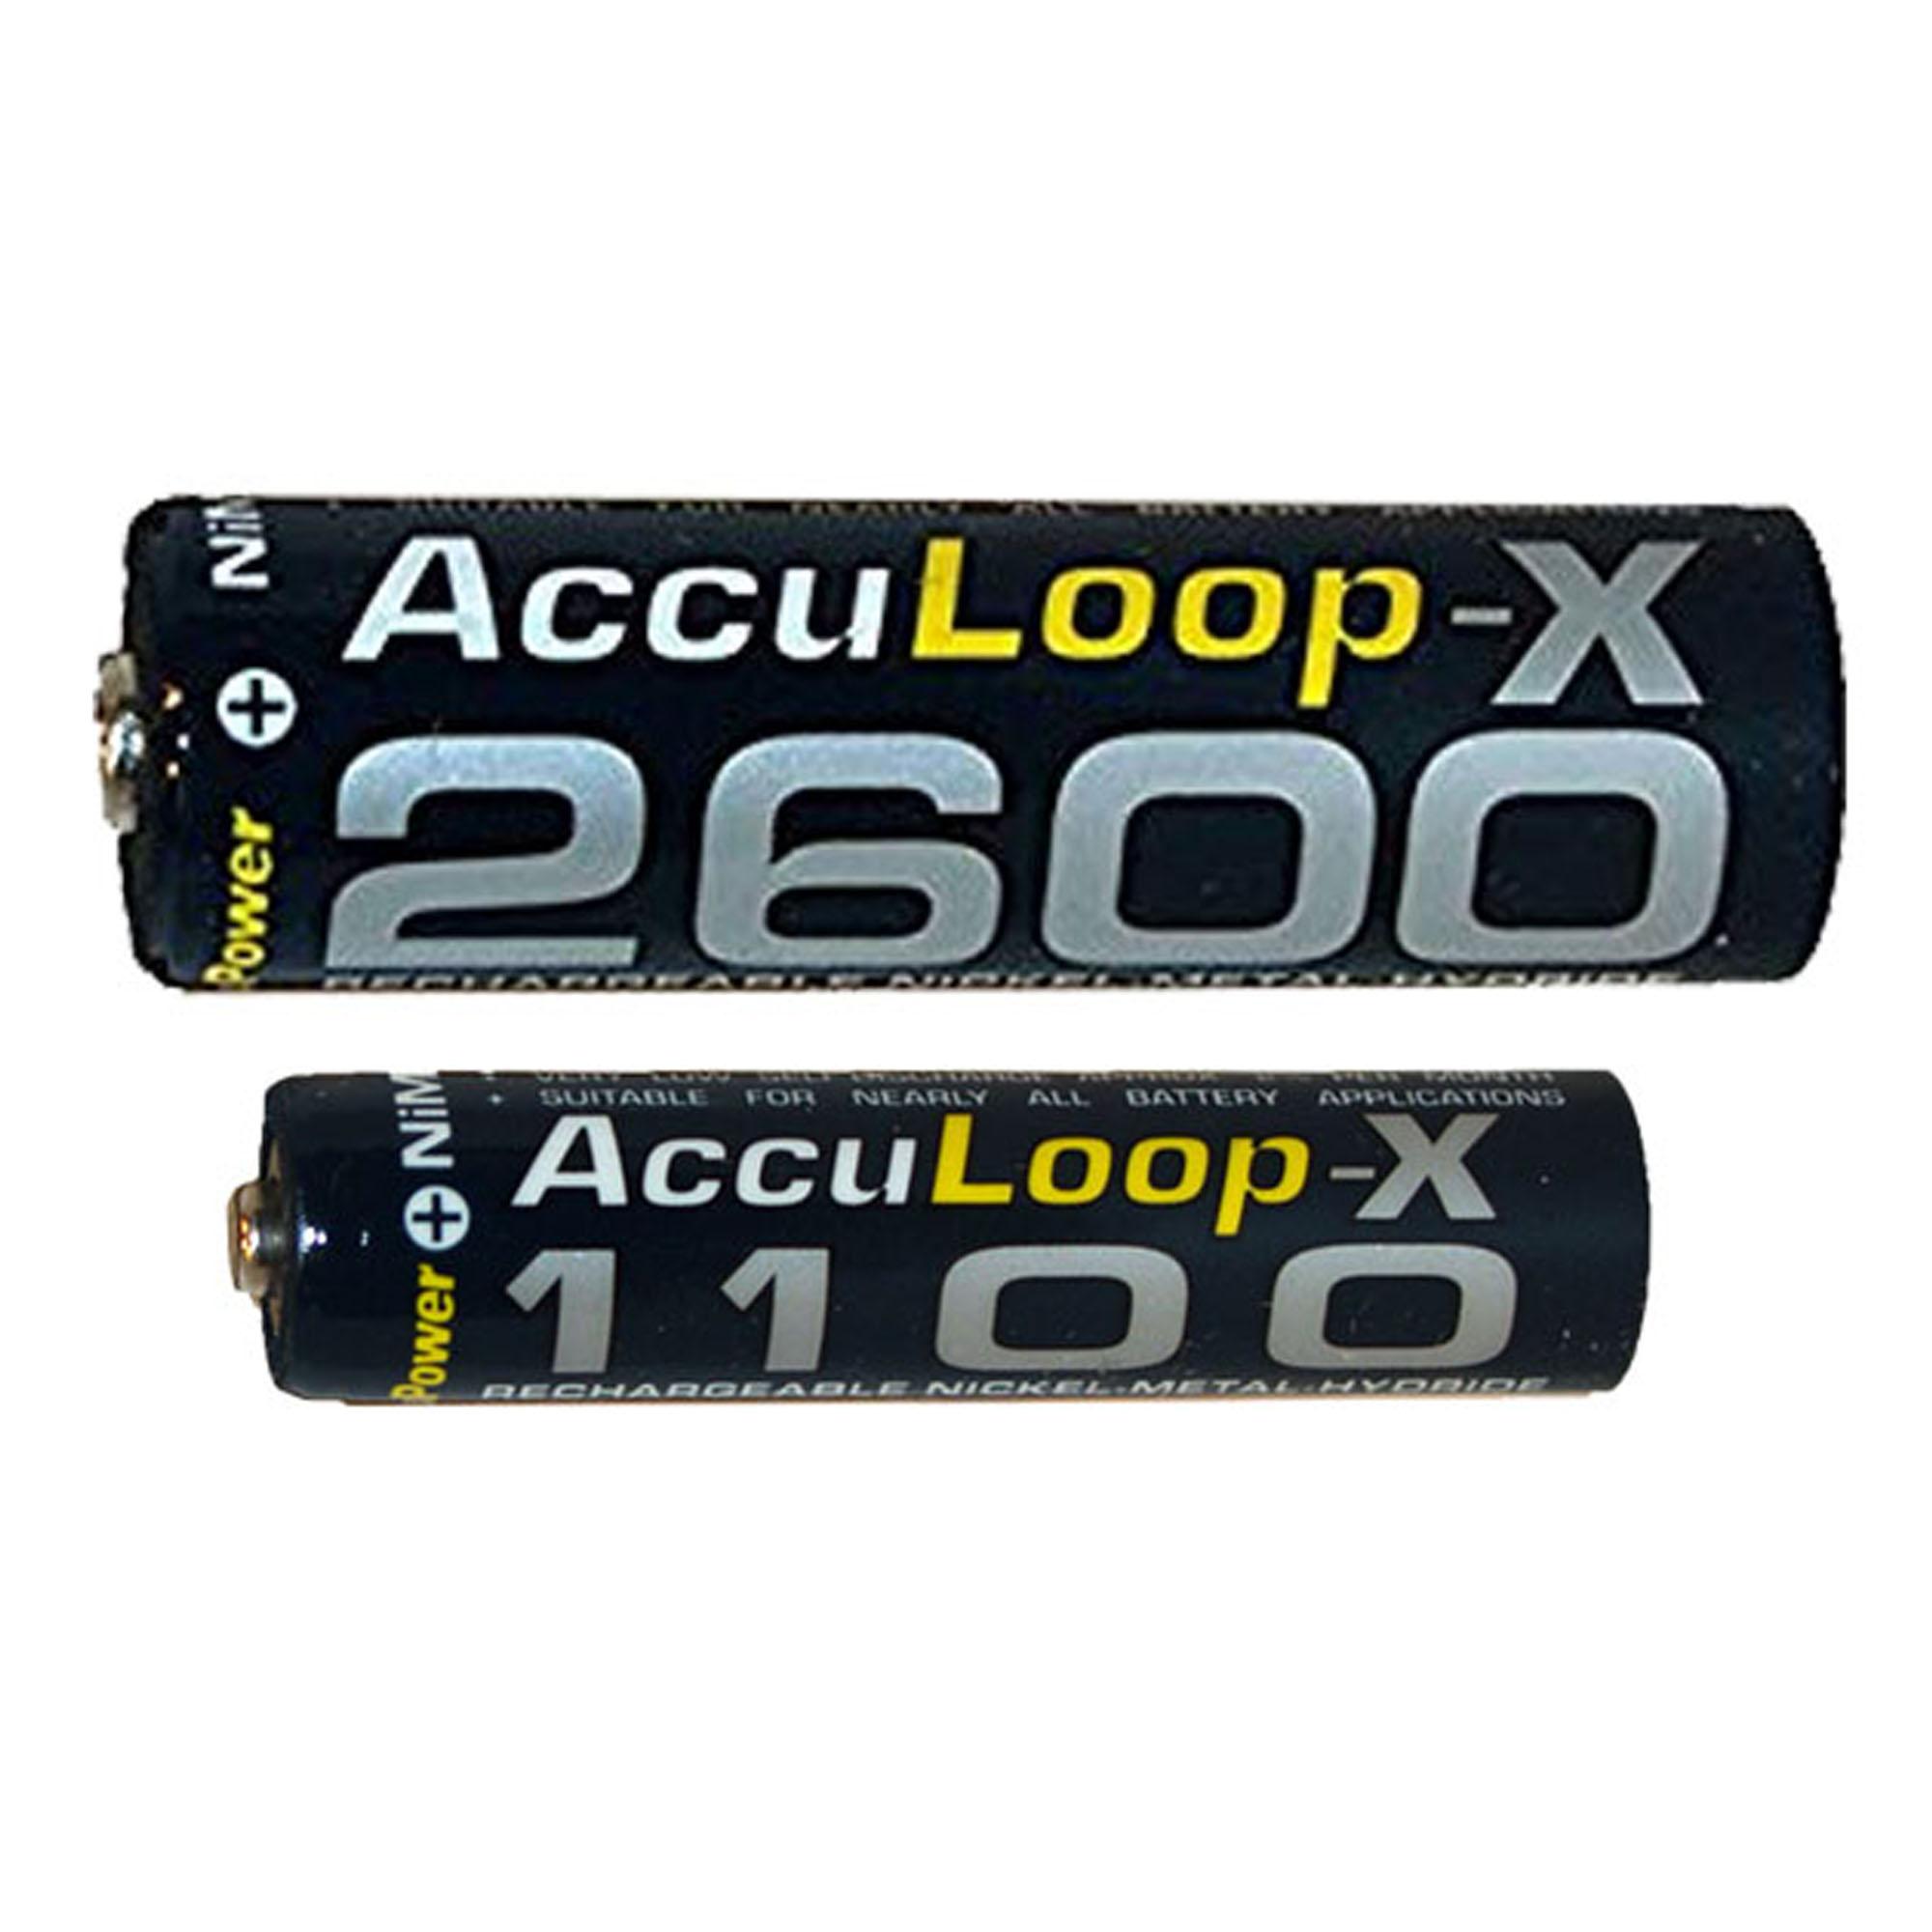 8 x AAA (1100 mAh) + 8 x AA (2600 mAh) AccuPower AccuLoop-X NiMH Battery Combo - image 1 de 1